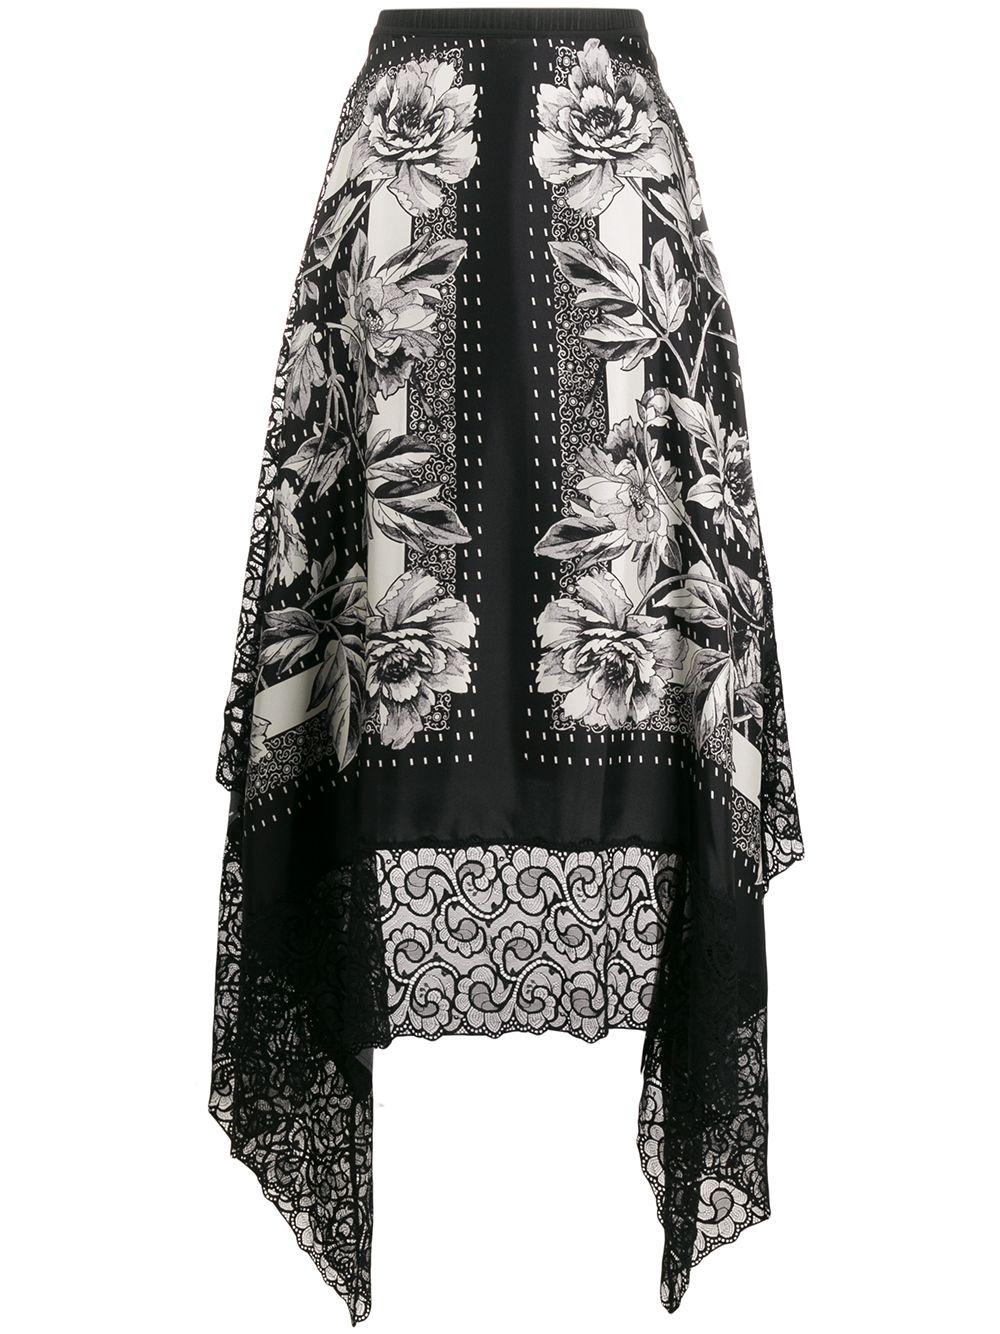 Antonio Marras floral print silk skirt